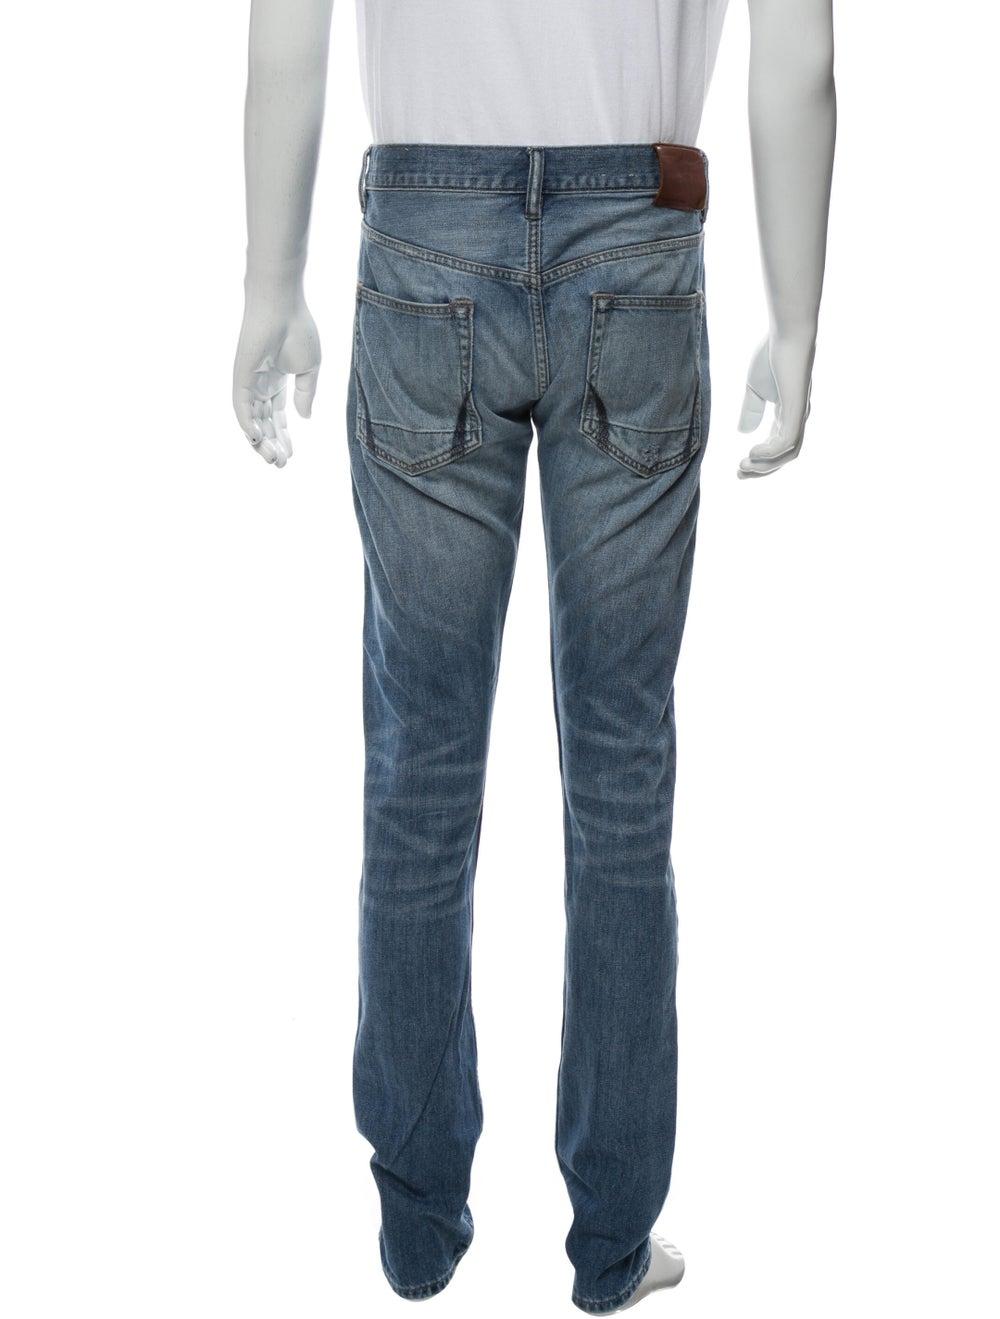 AllSaints Skinny Jeans Blue - image 3